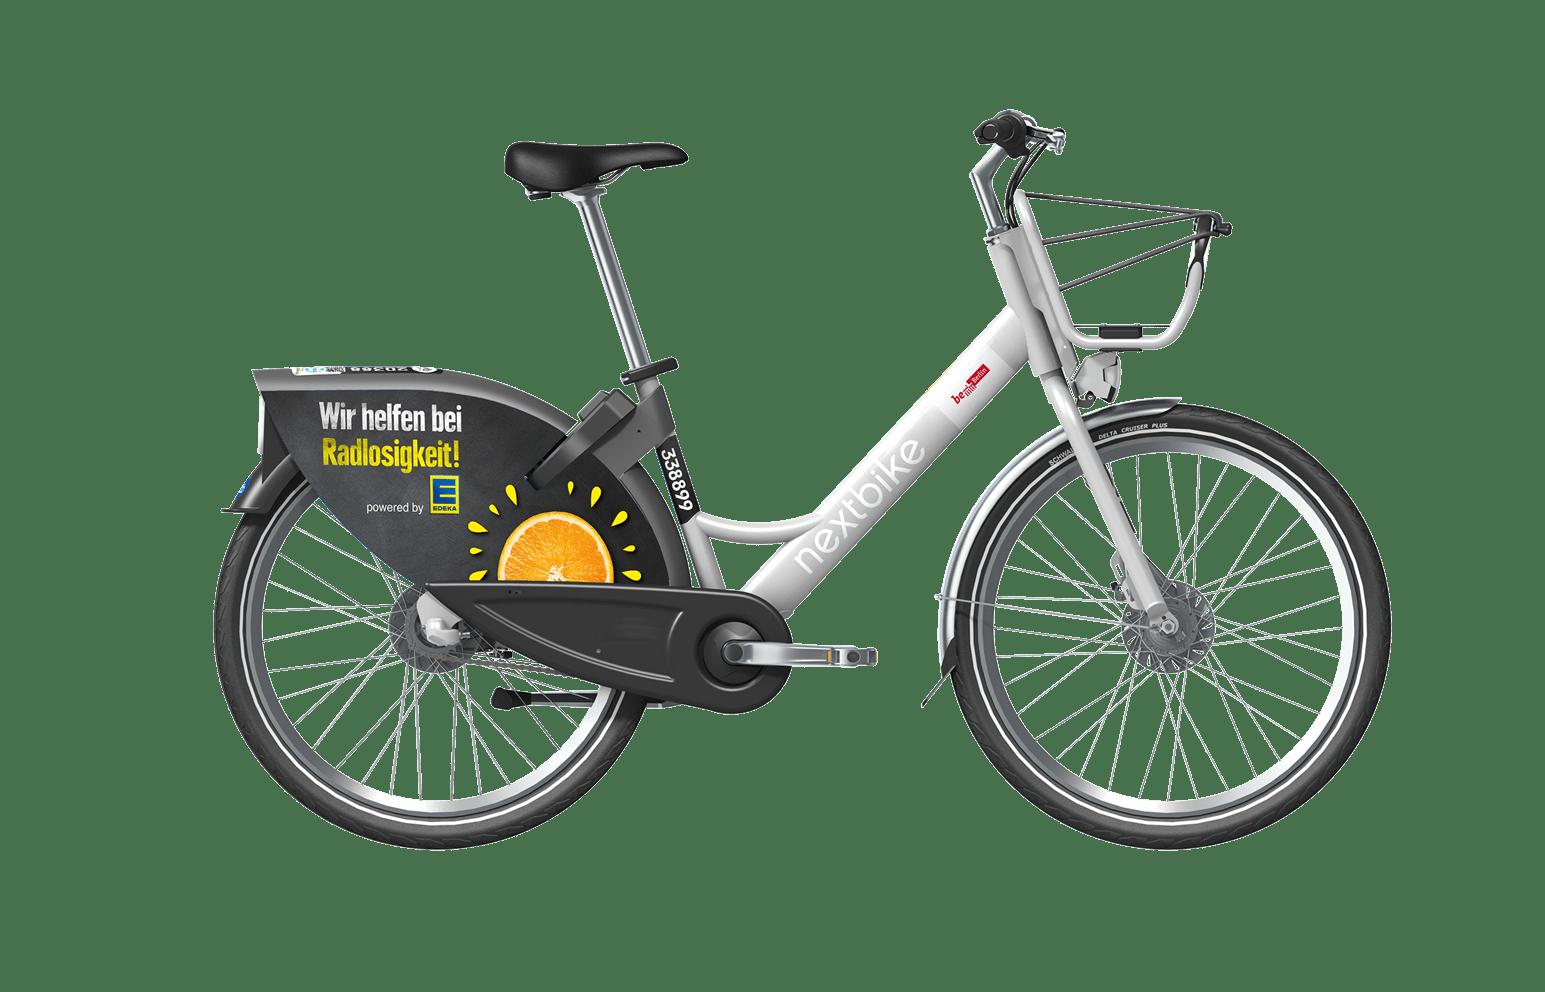 smartbike 2.0 mit edeka branding